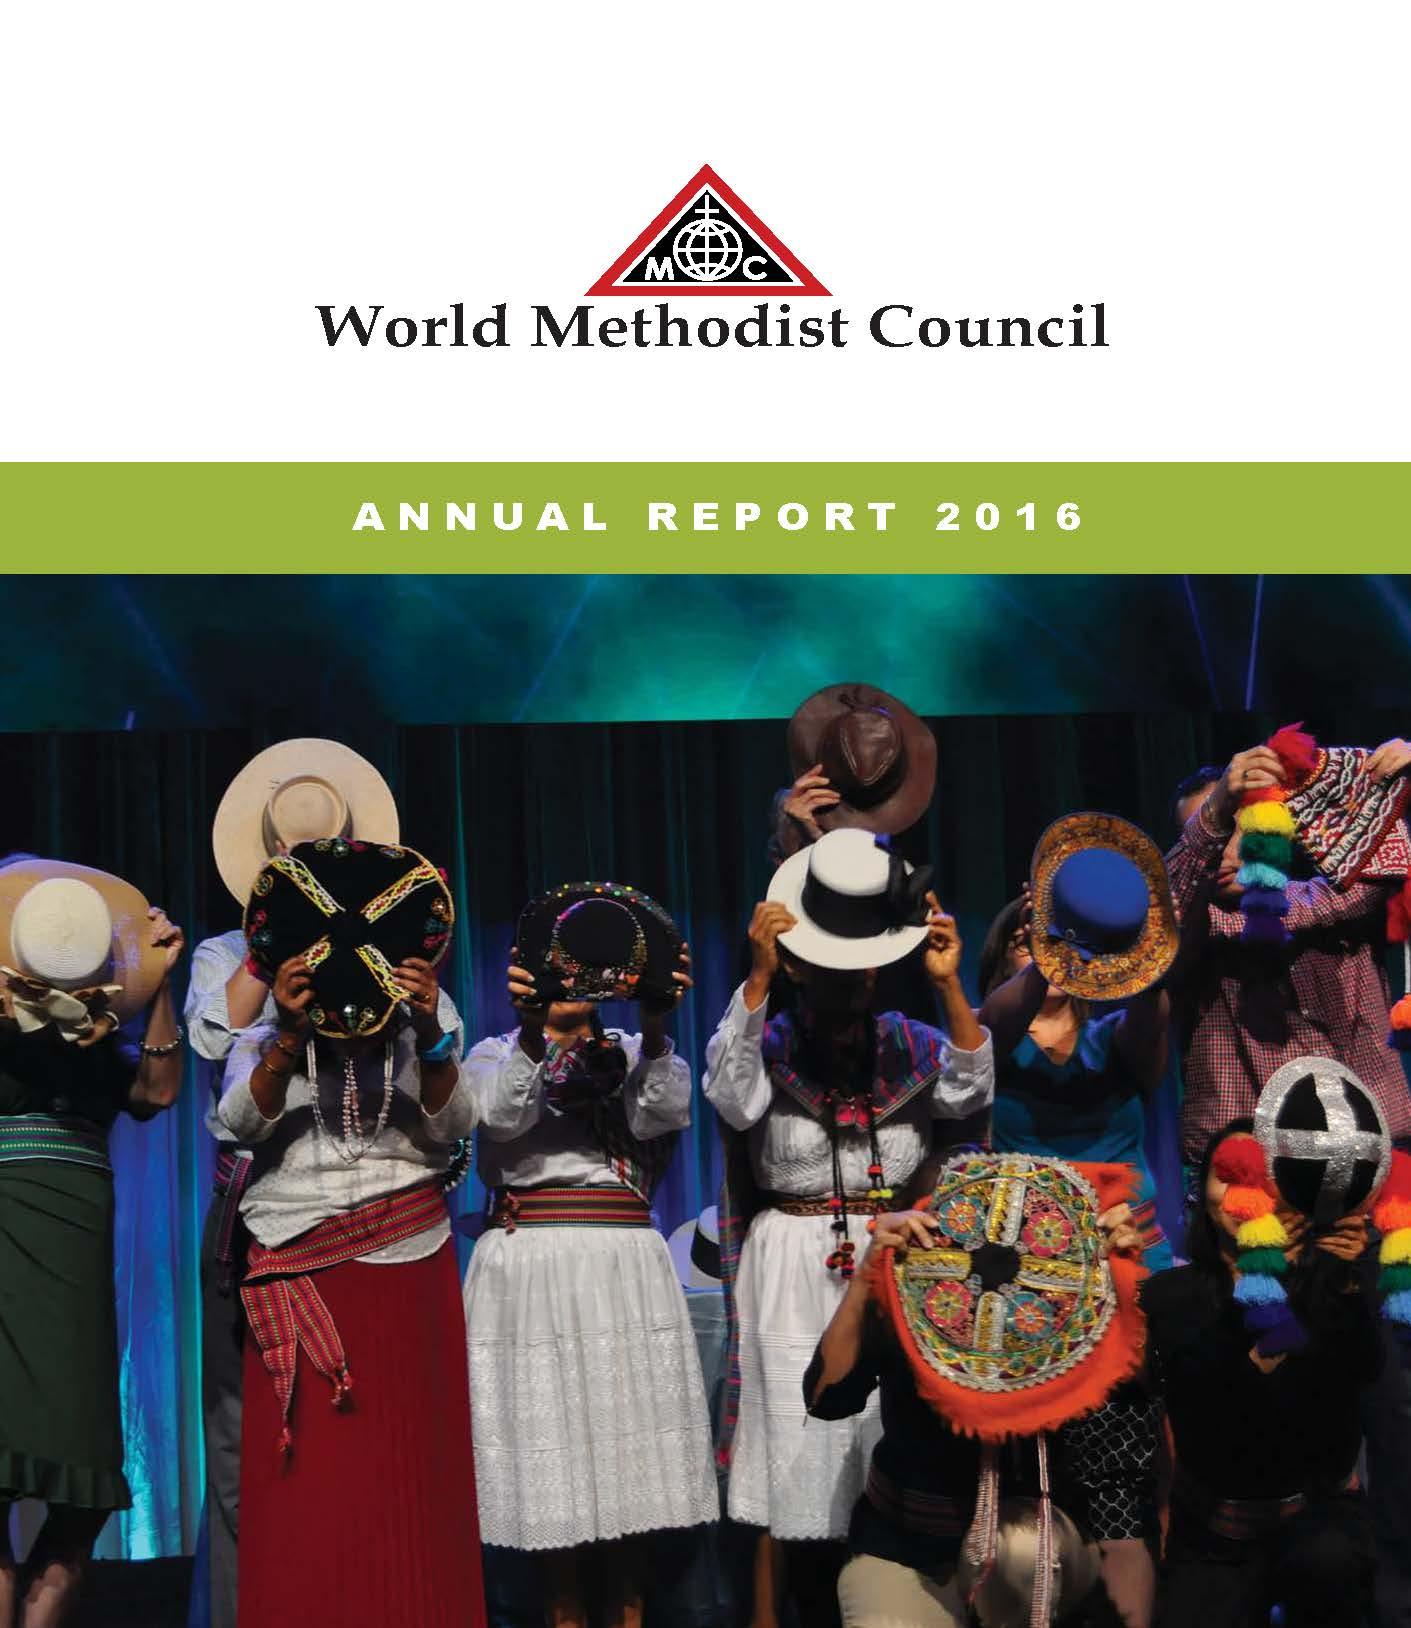 WMC_2016_Annual_Report_Page_01